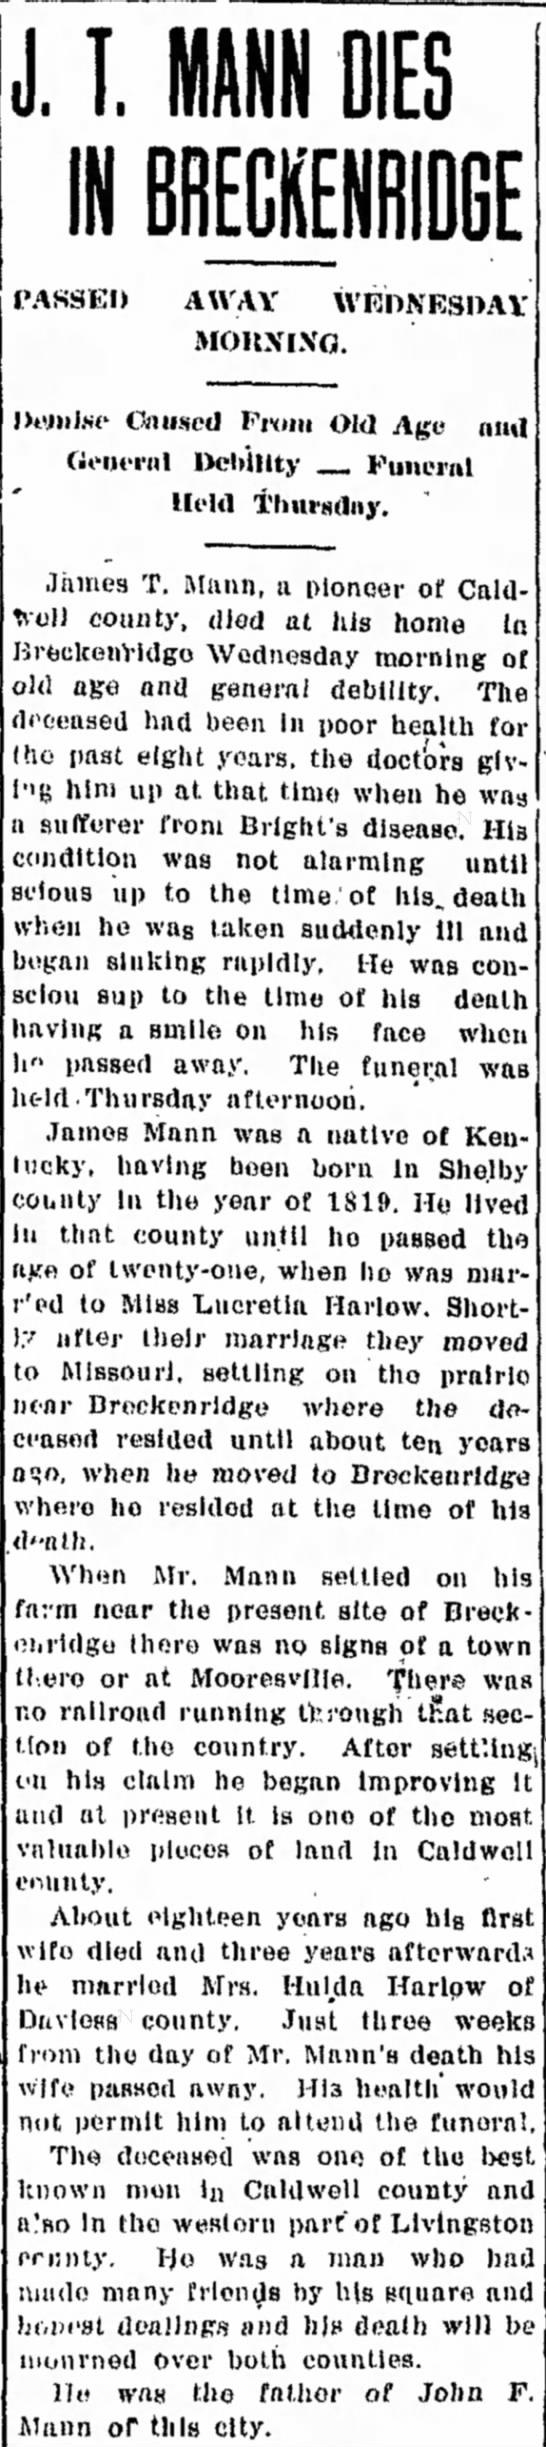 Mann, James Thomas. The Chillicothe Consitution-Tribune (Chillicothe, MO)20 Nov 1908 - Obituary